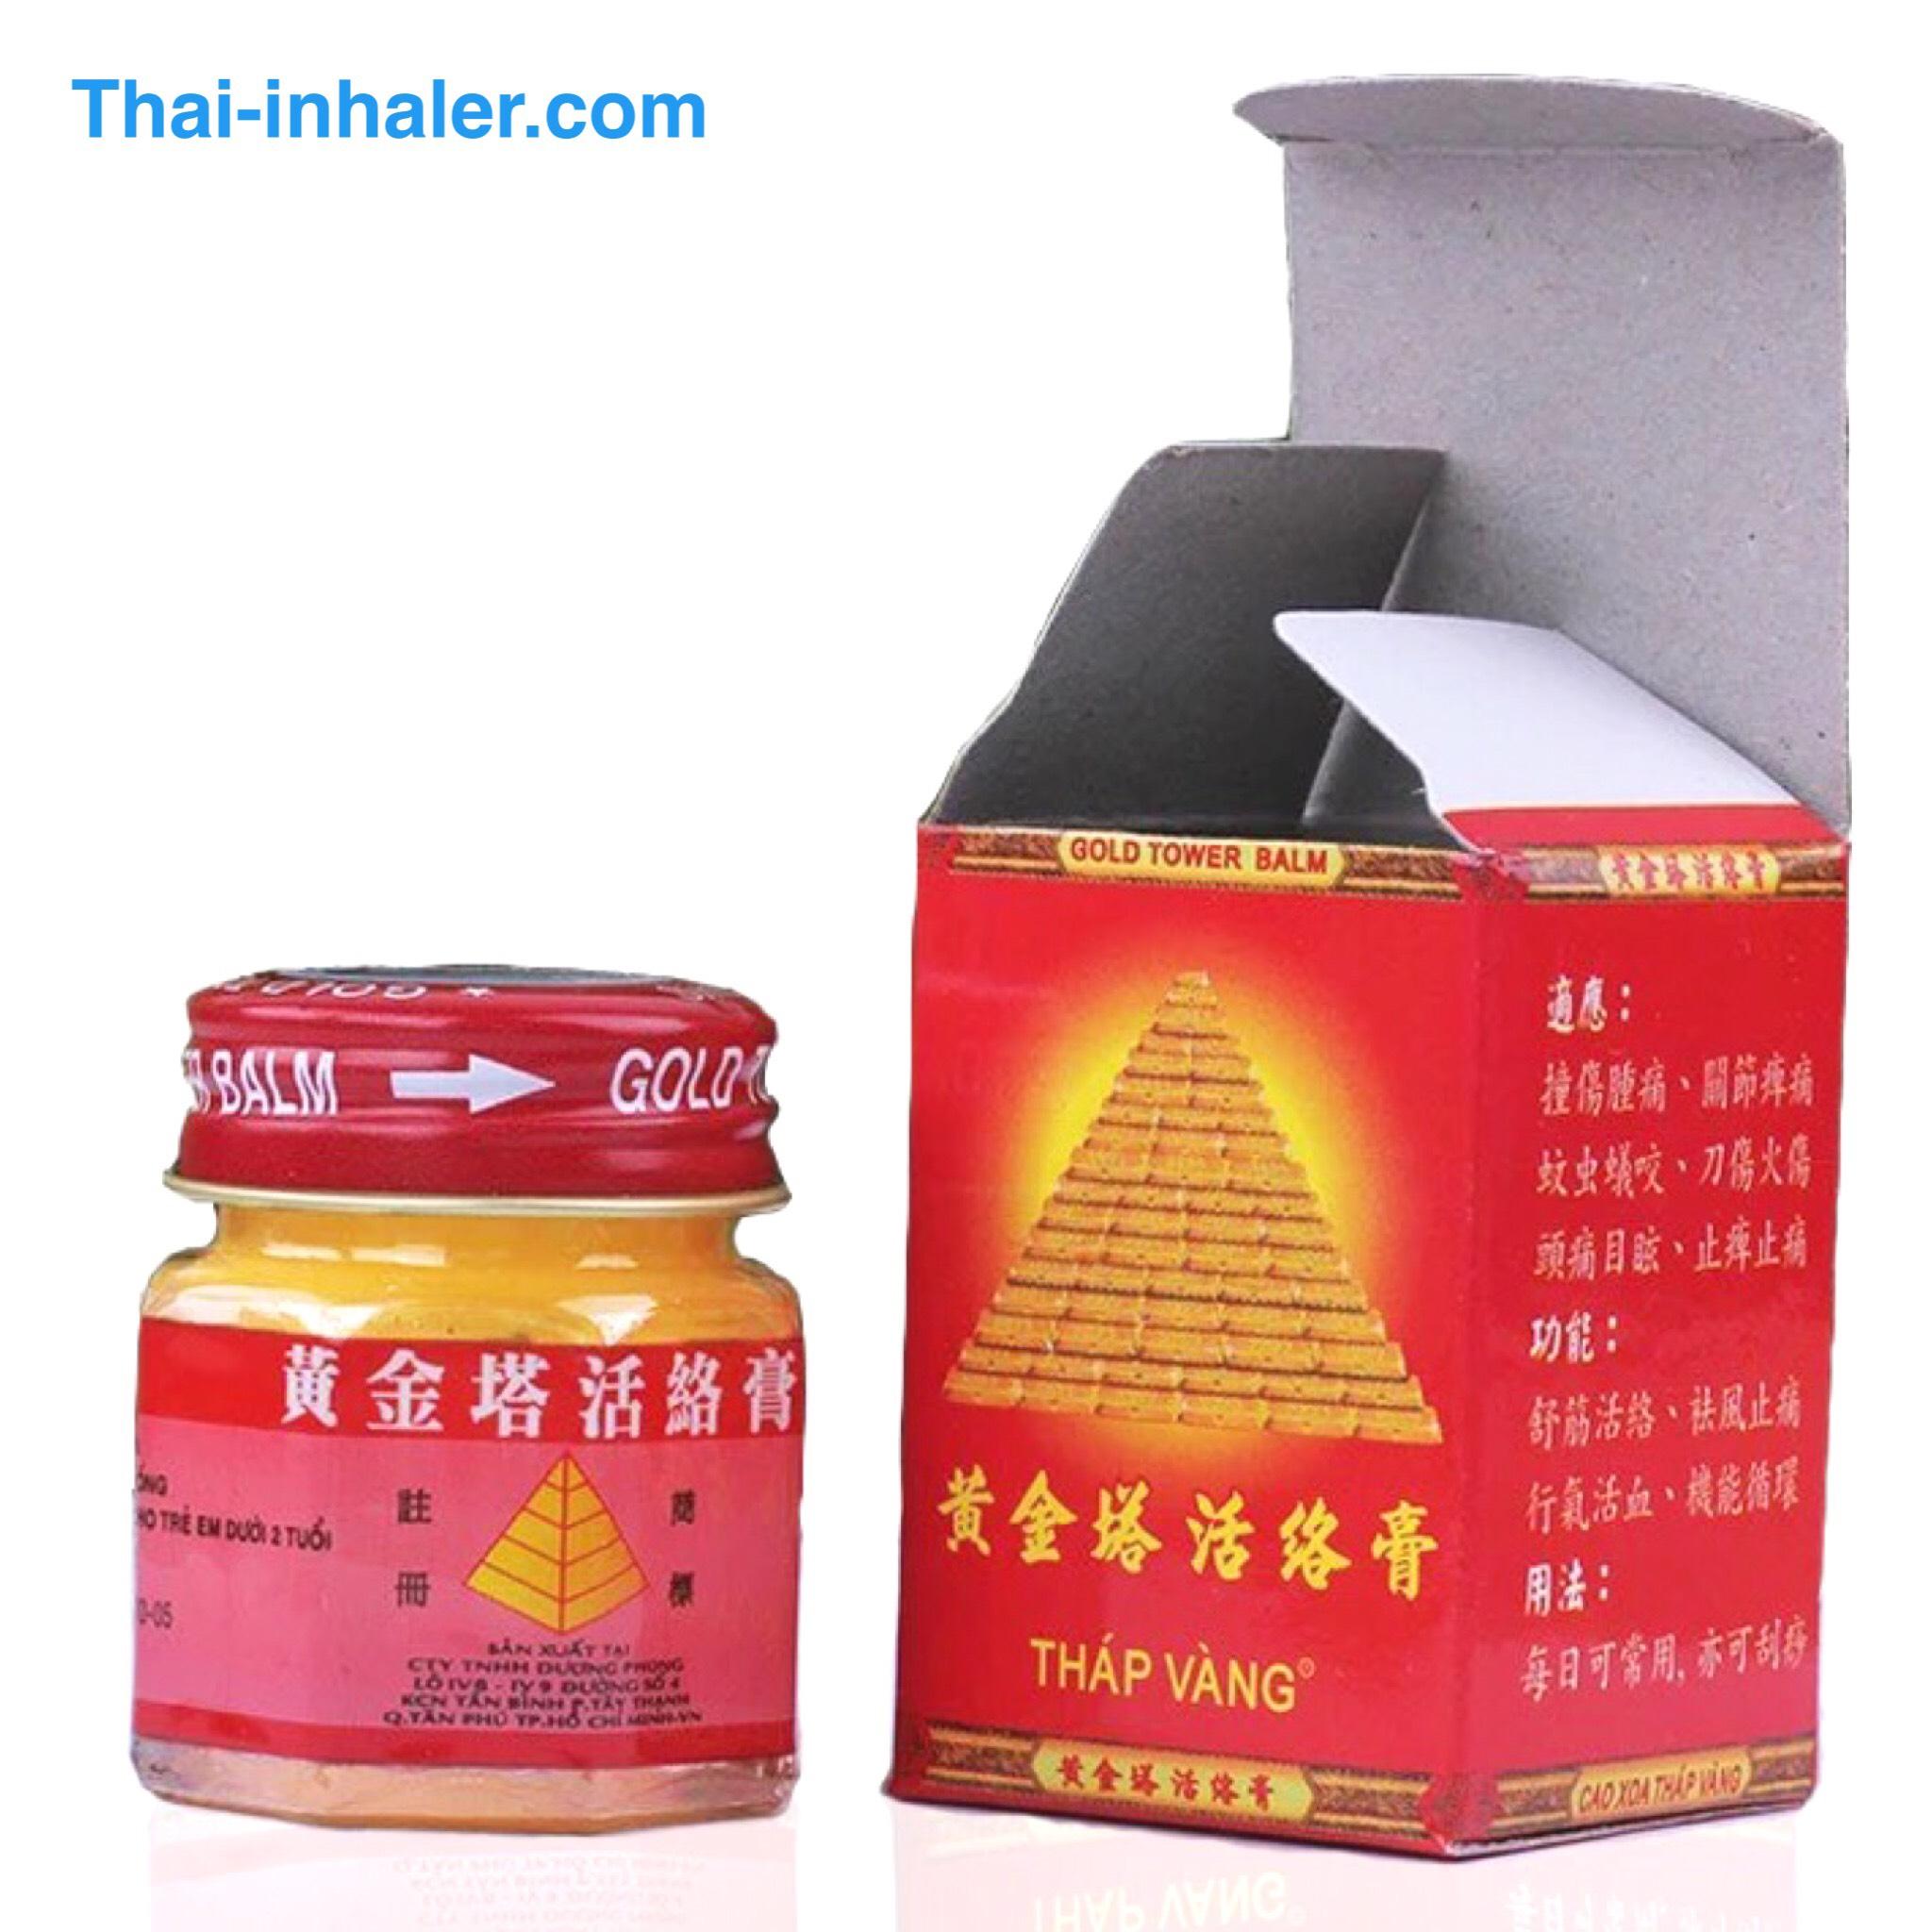 Taisho Counterpain Thailand Analgesic Balm 120 Grams 120g Gold Tower Vietnam Ointment 20 1 Piece